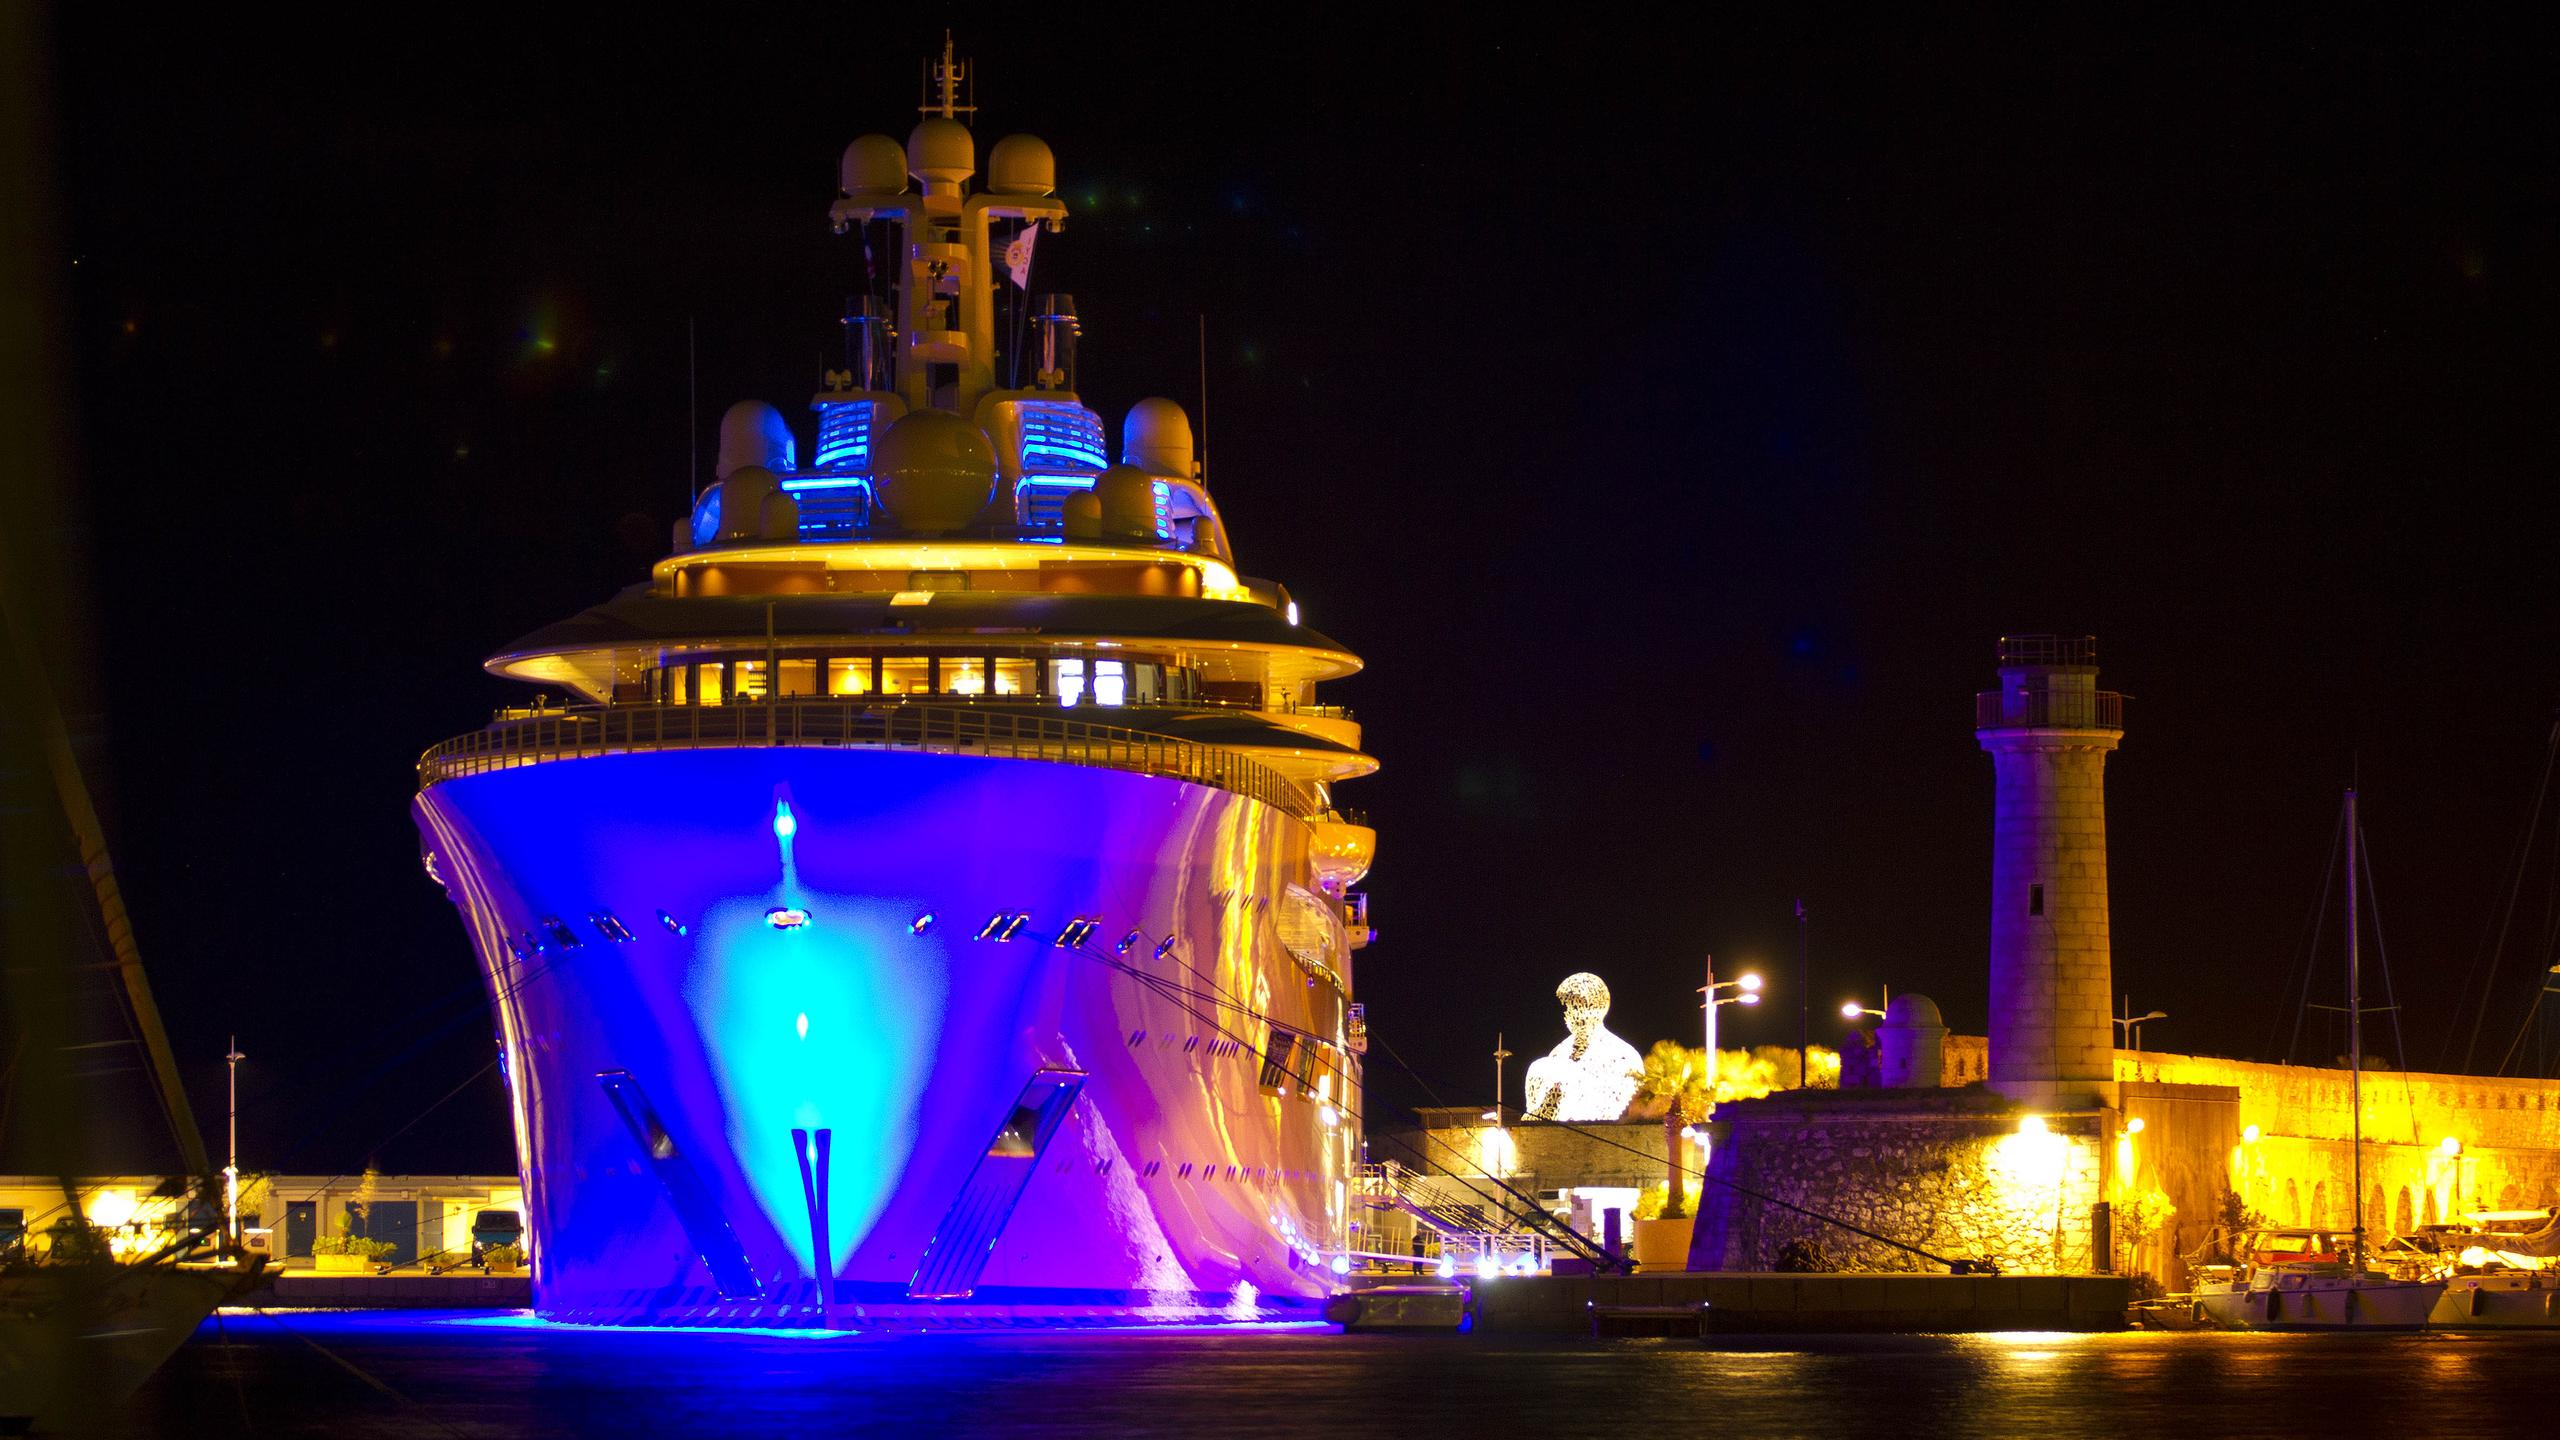 dilbar-motor-yacht-lurssen-2016-156m-bow-by-night